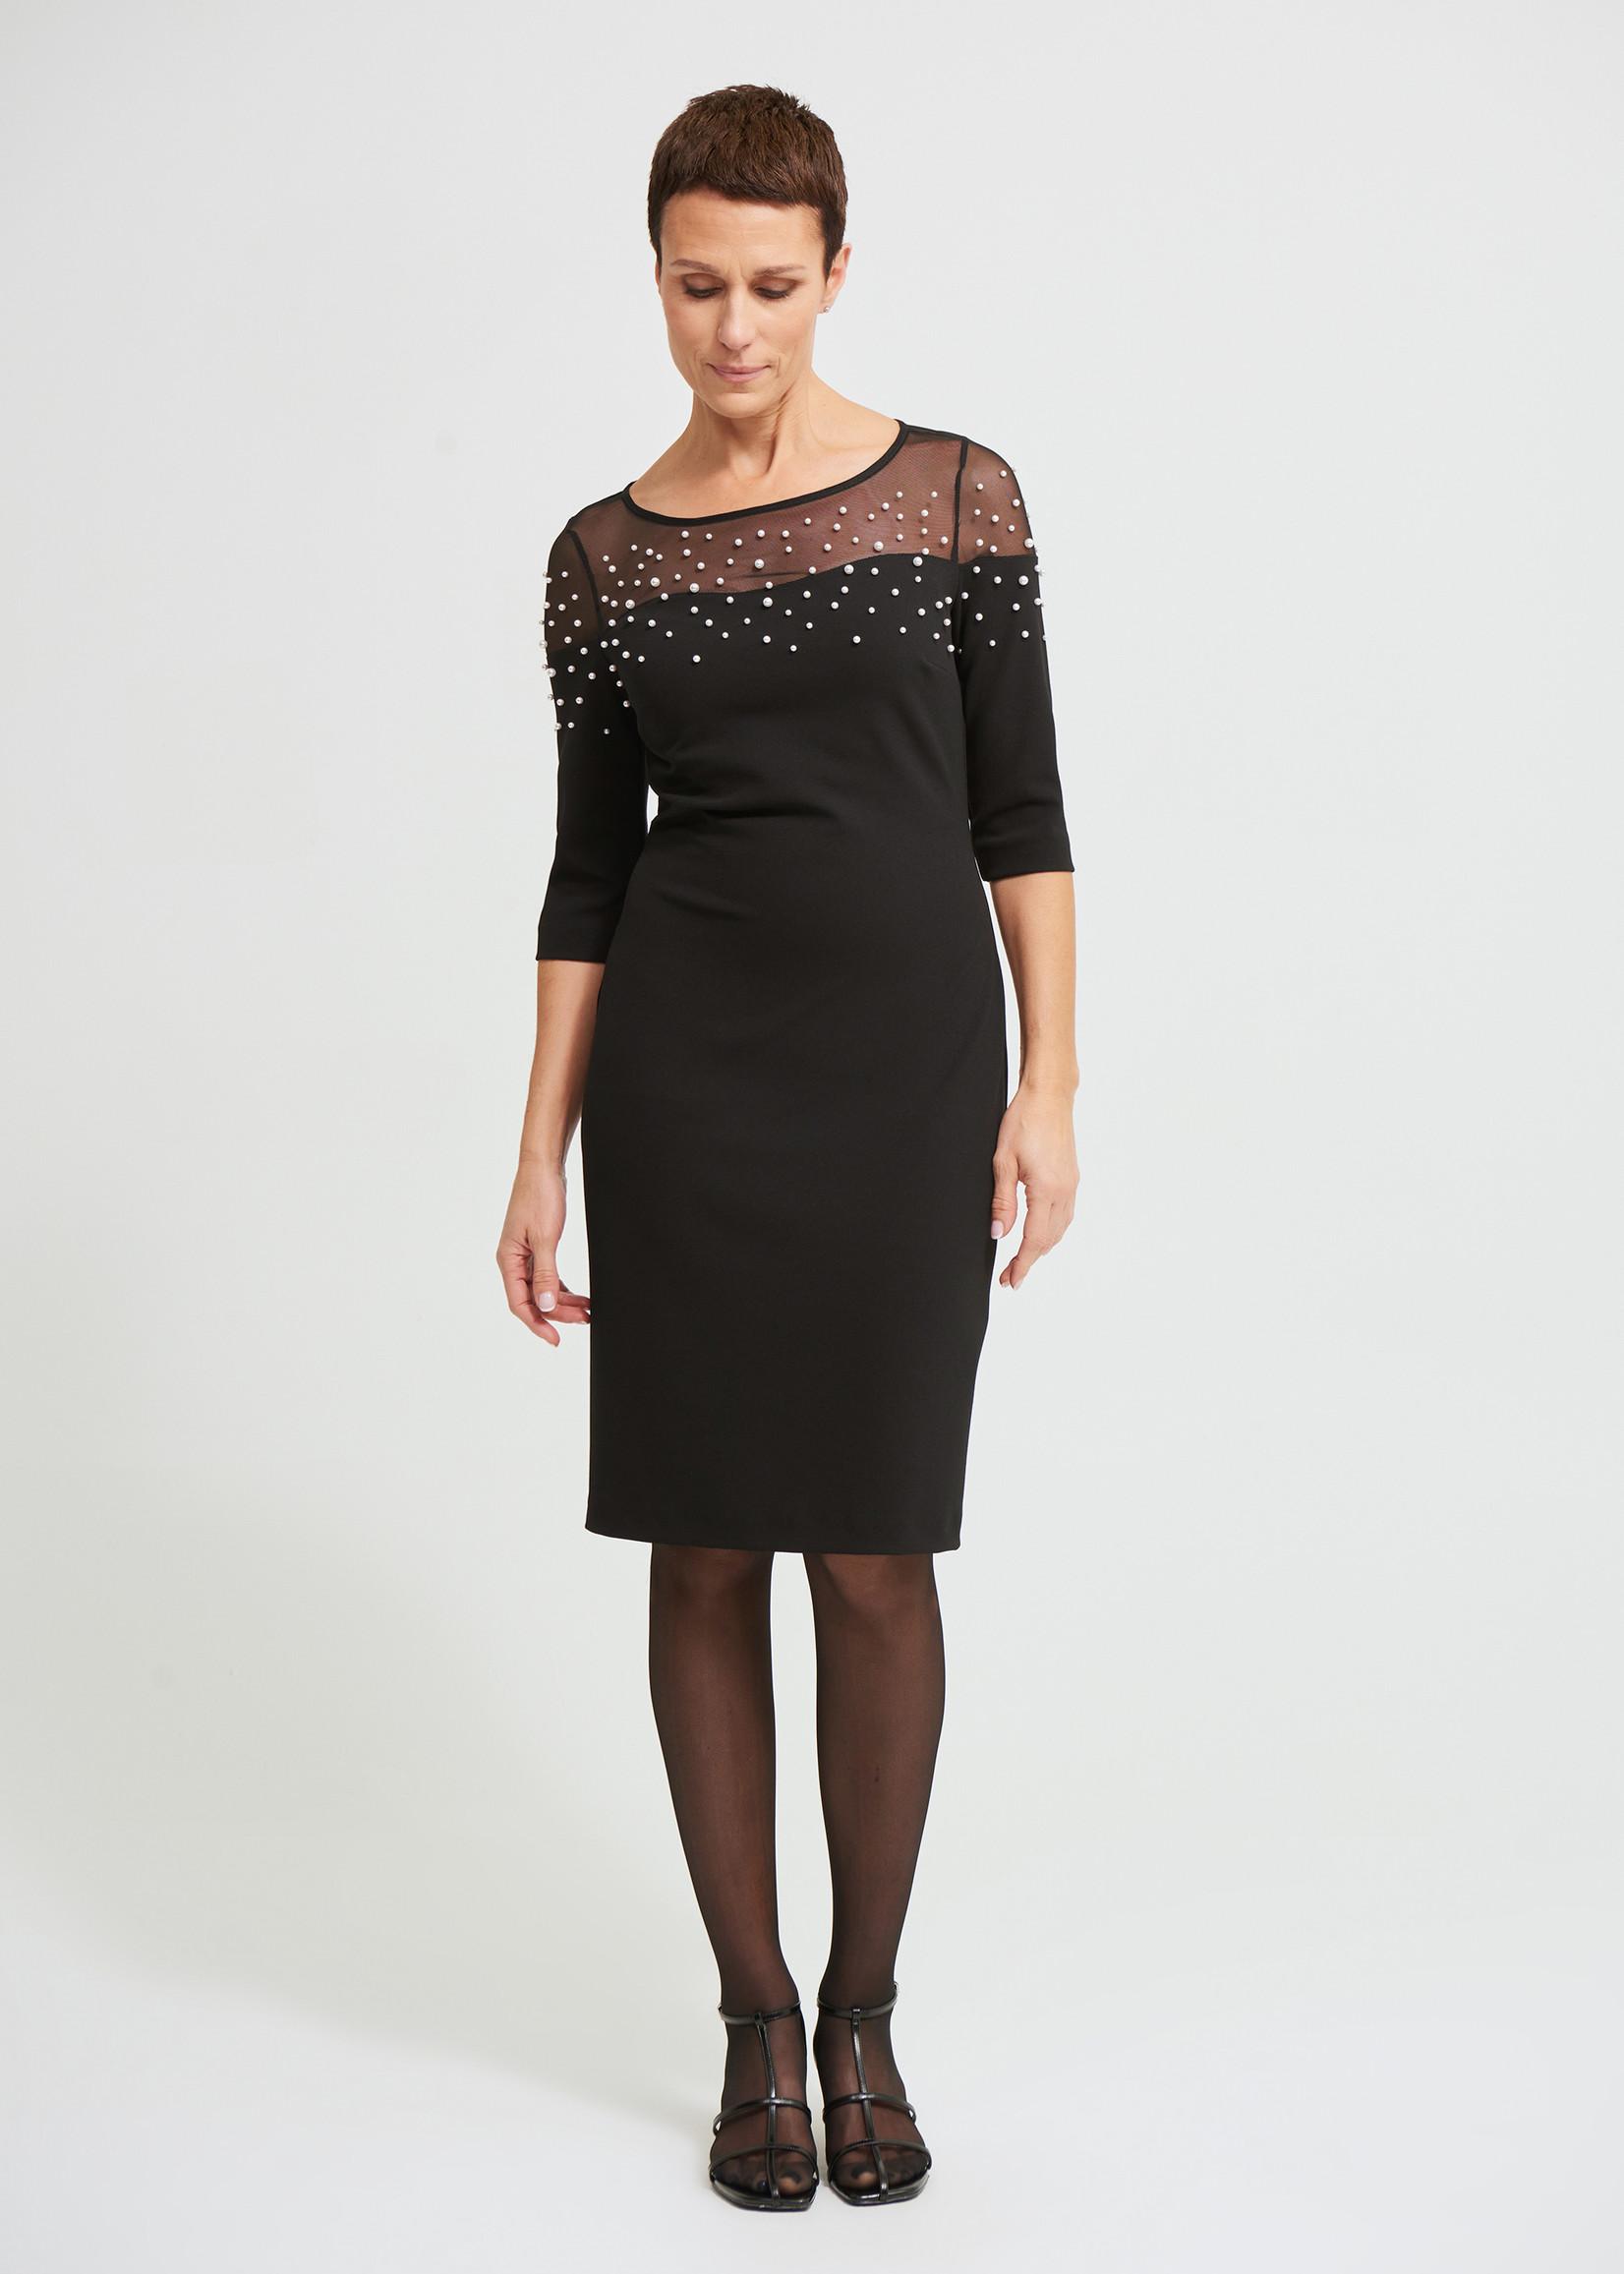 Joseph Ribkoff Dress with Pearl Details